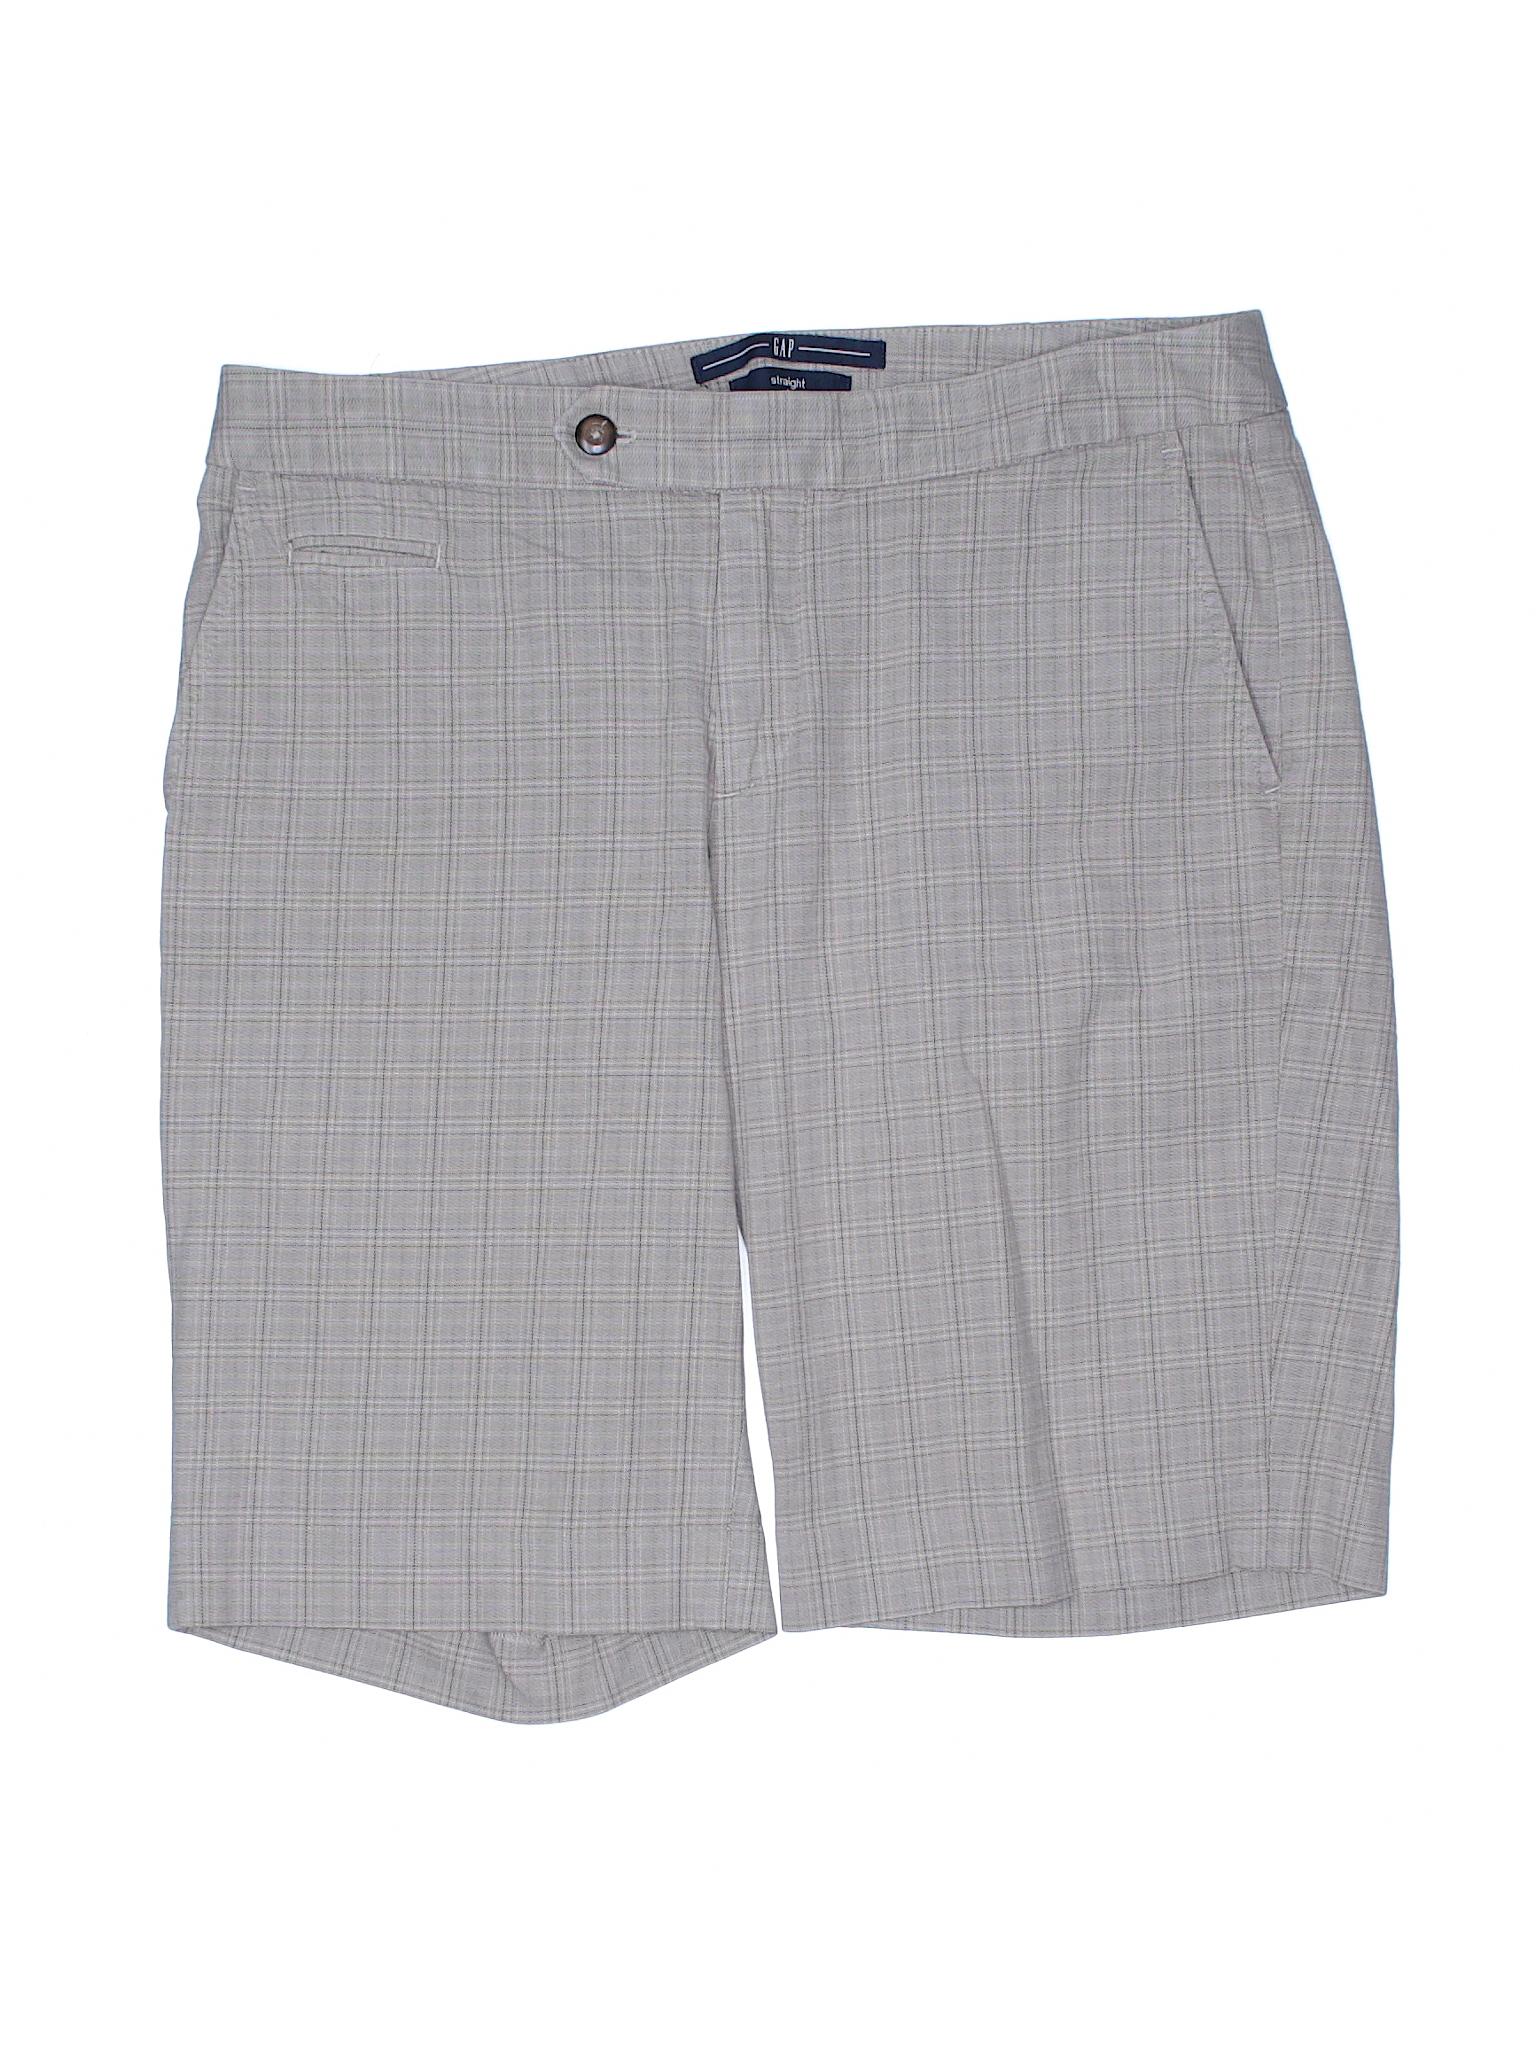 Shorts Boutique Boutique Shorts Shorts Gap Boutique Gap Gap qaCRdq